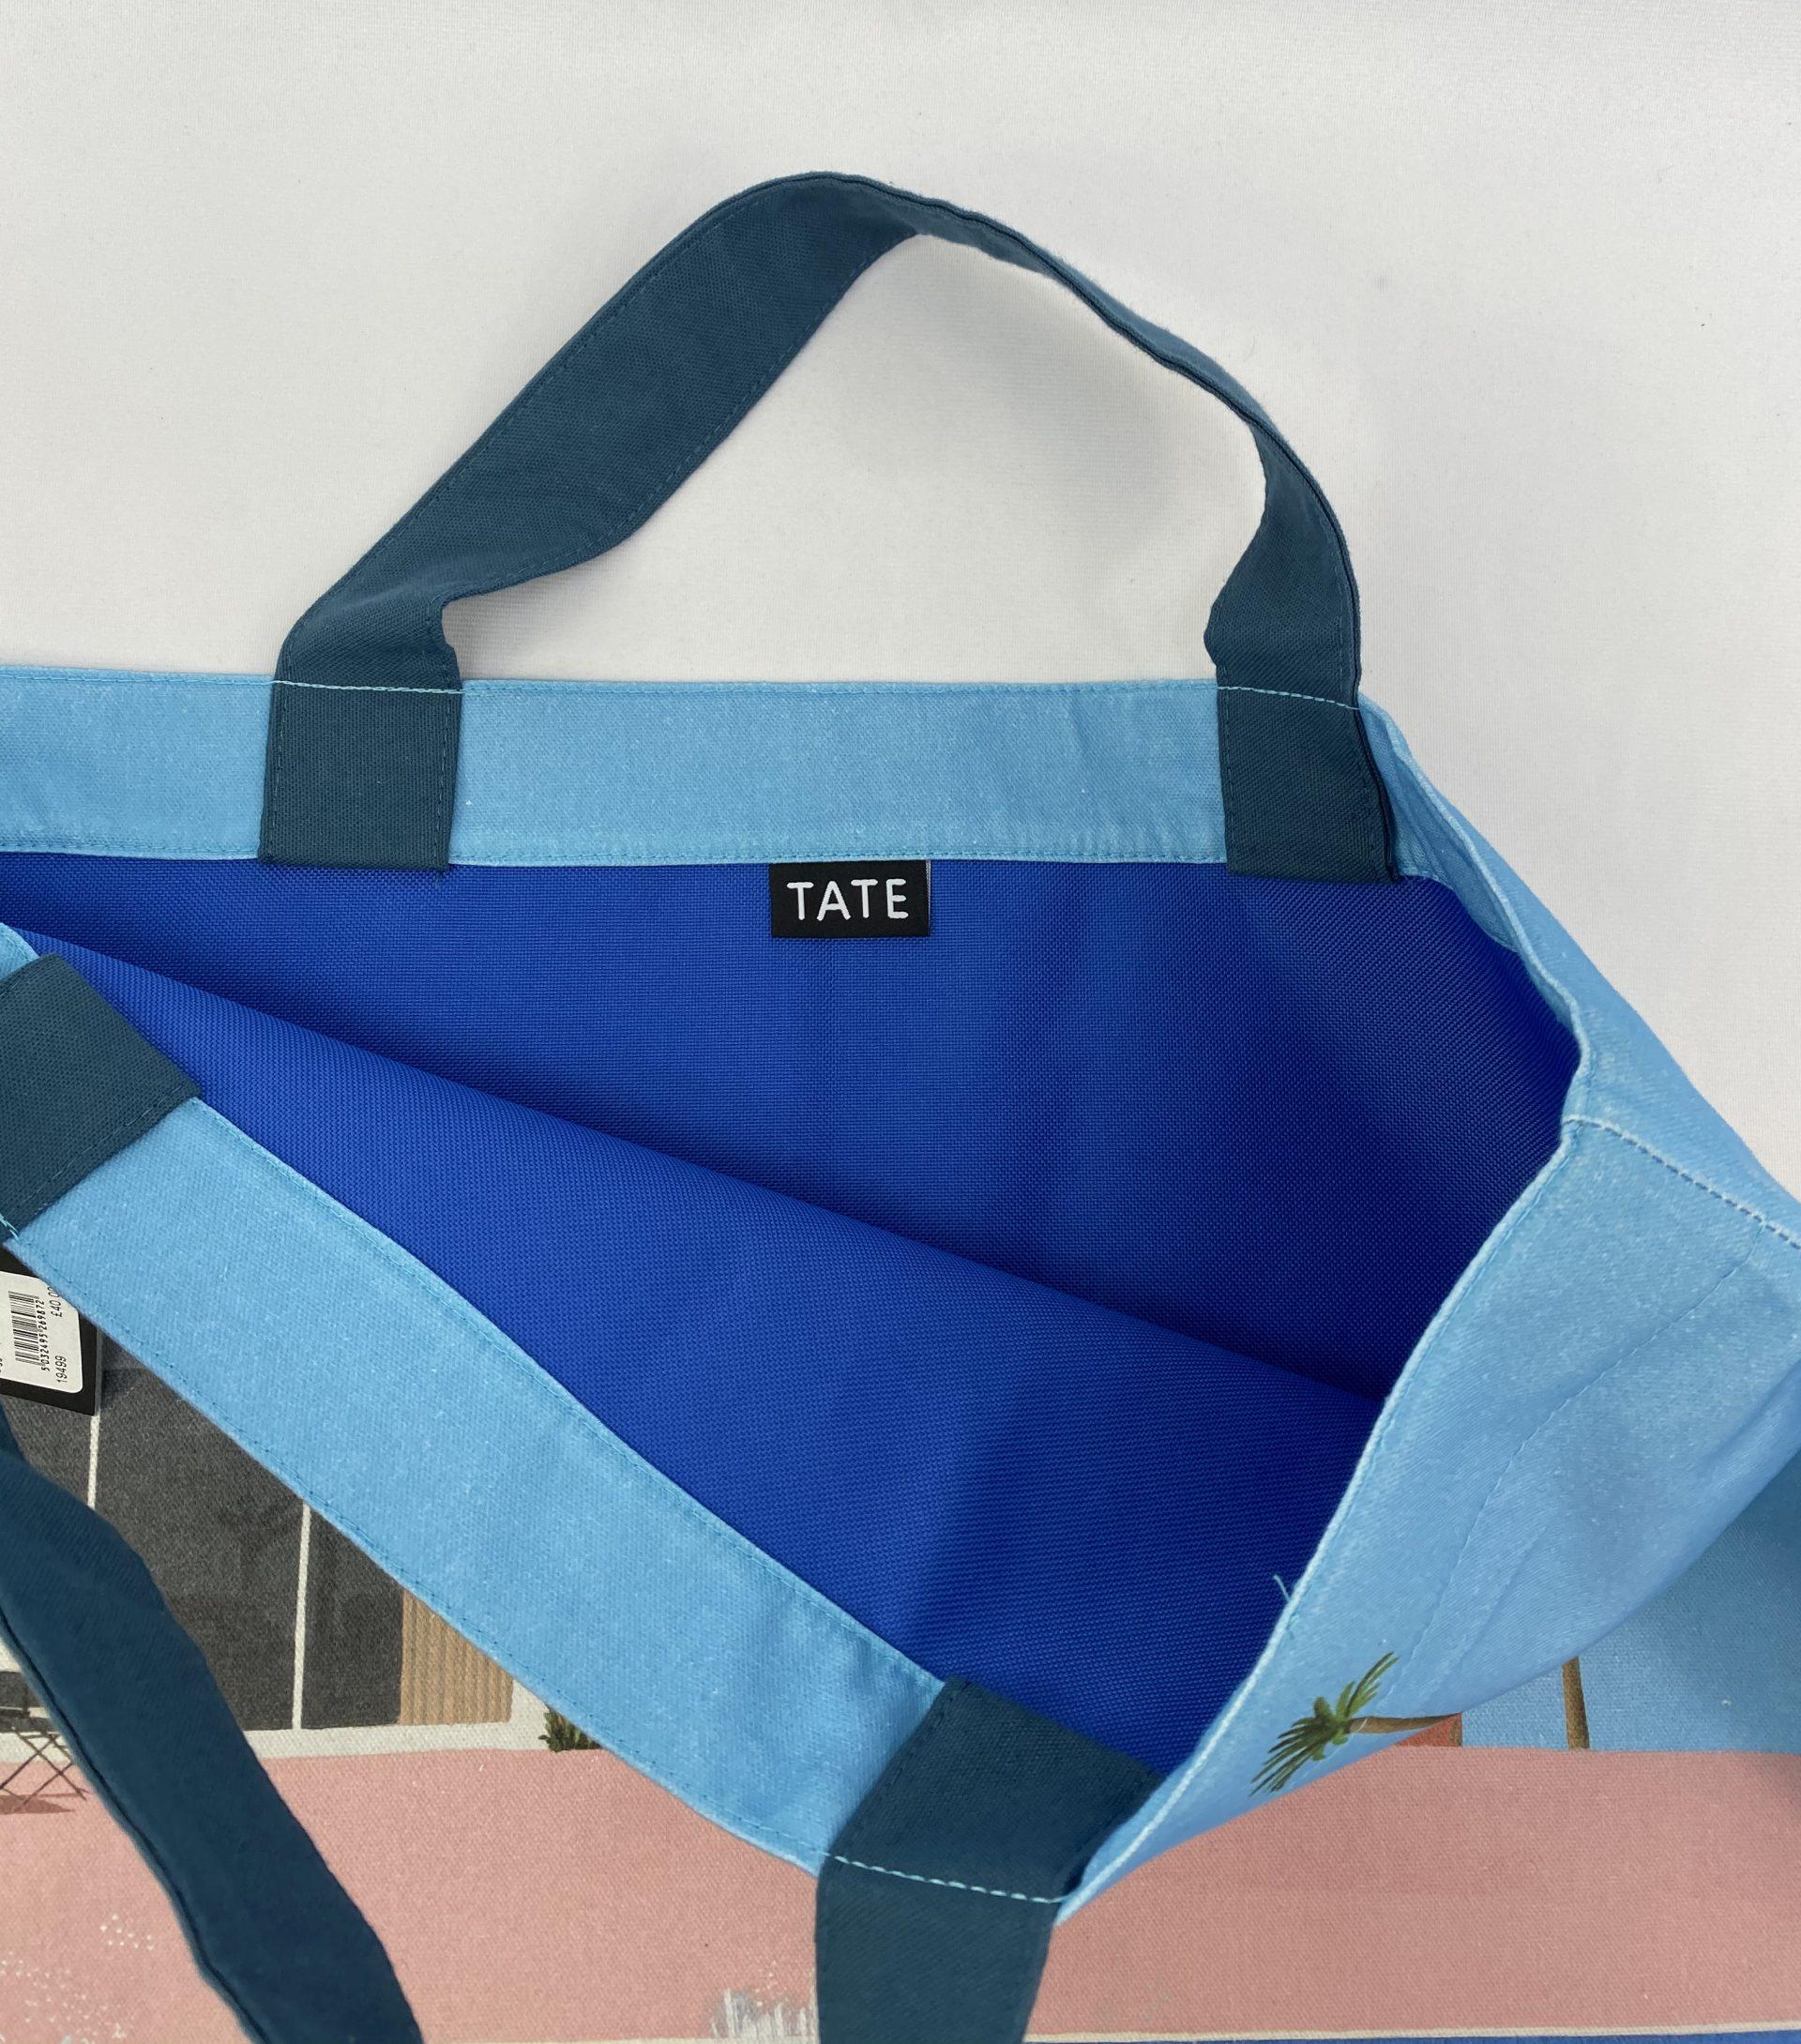 Tate David Hockney Exhibition tote bag